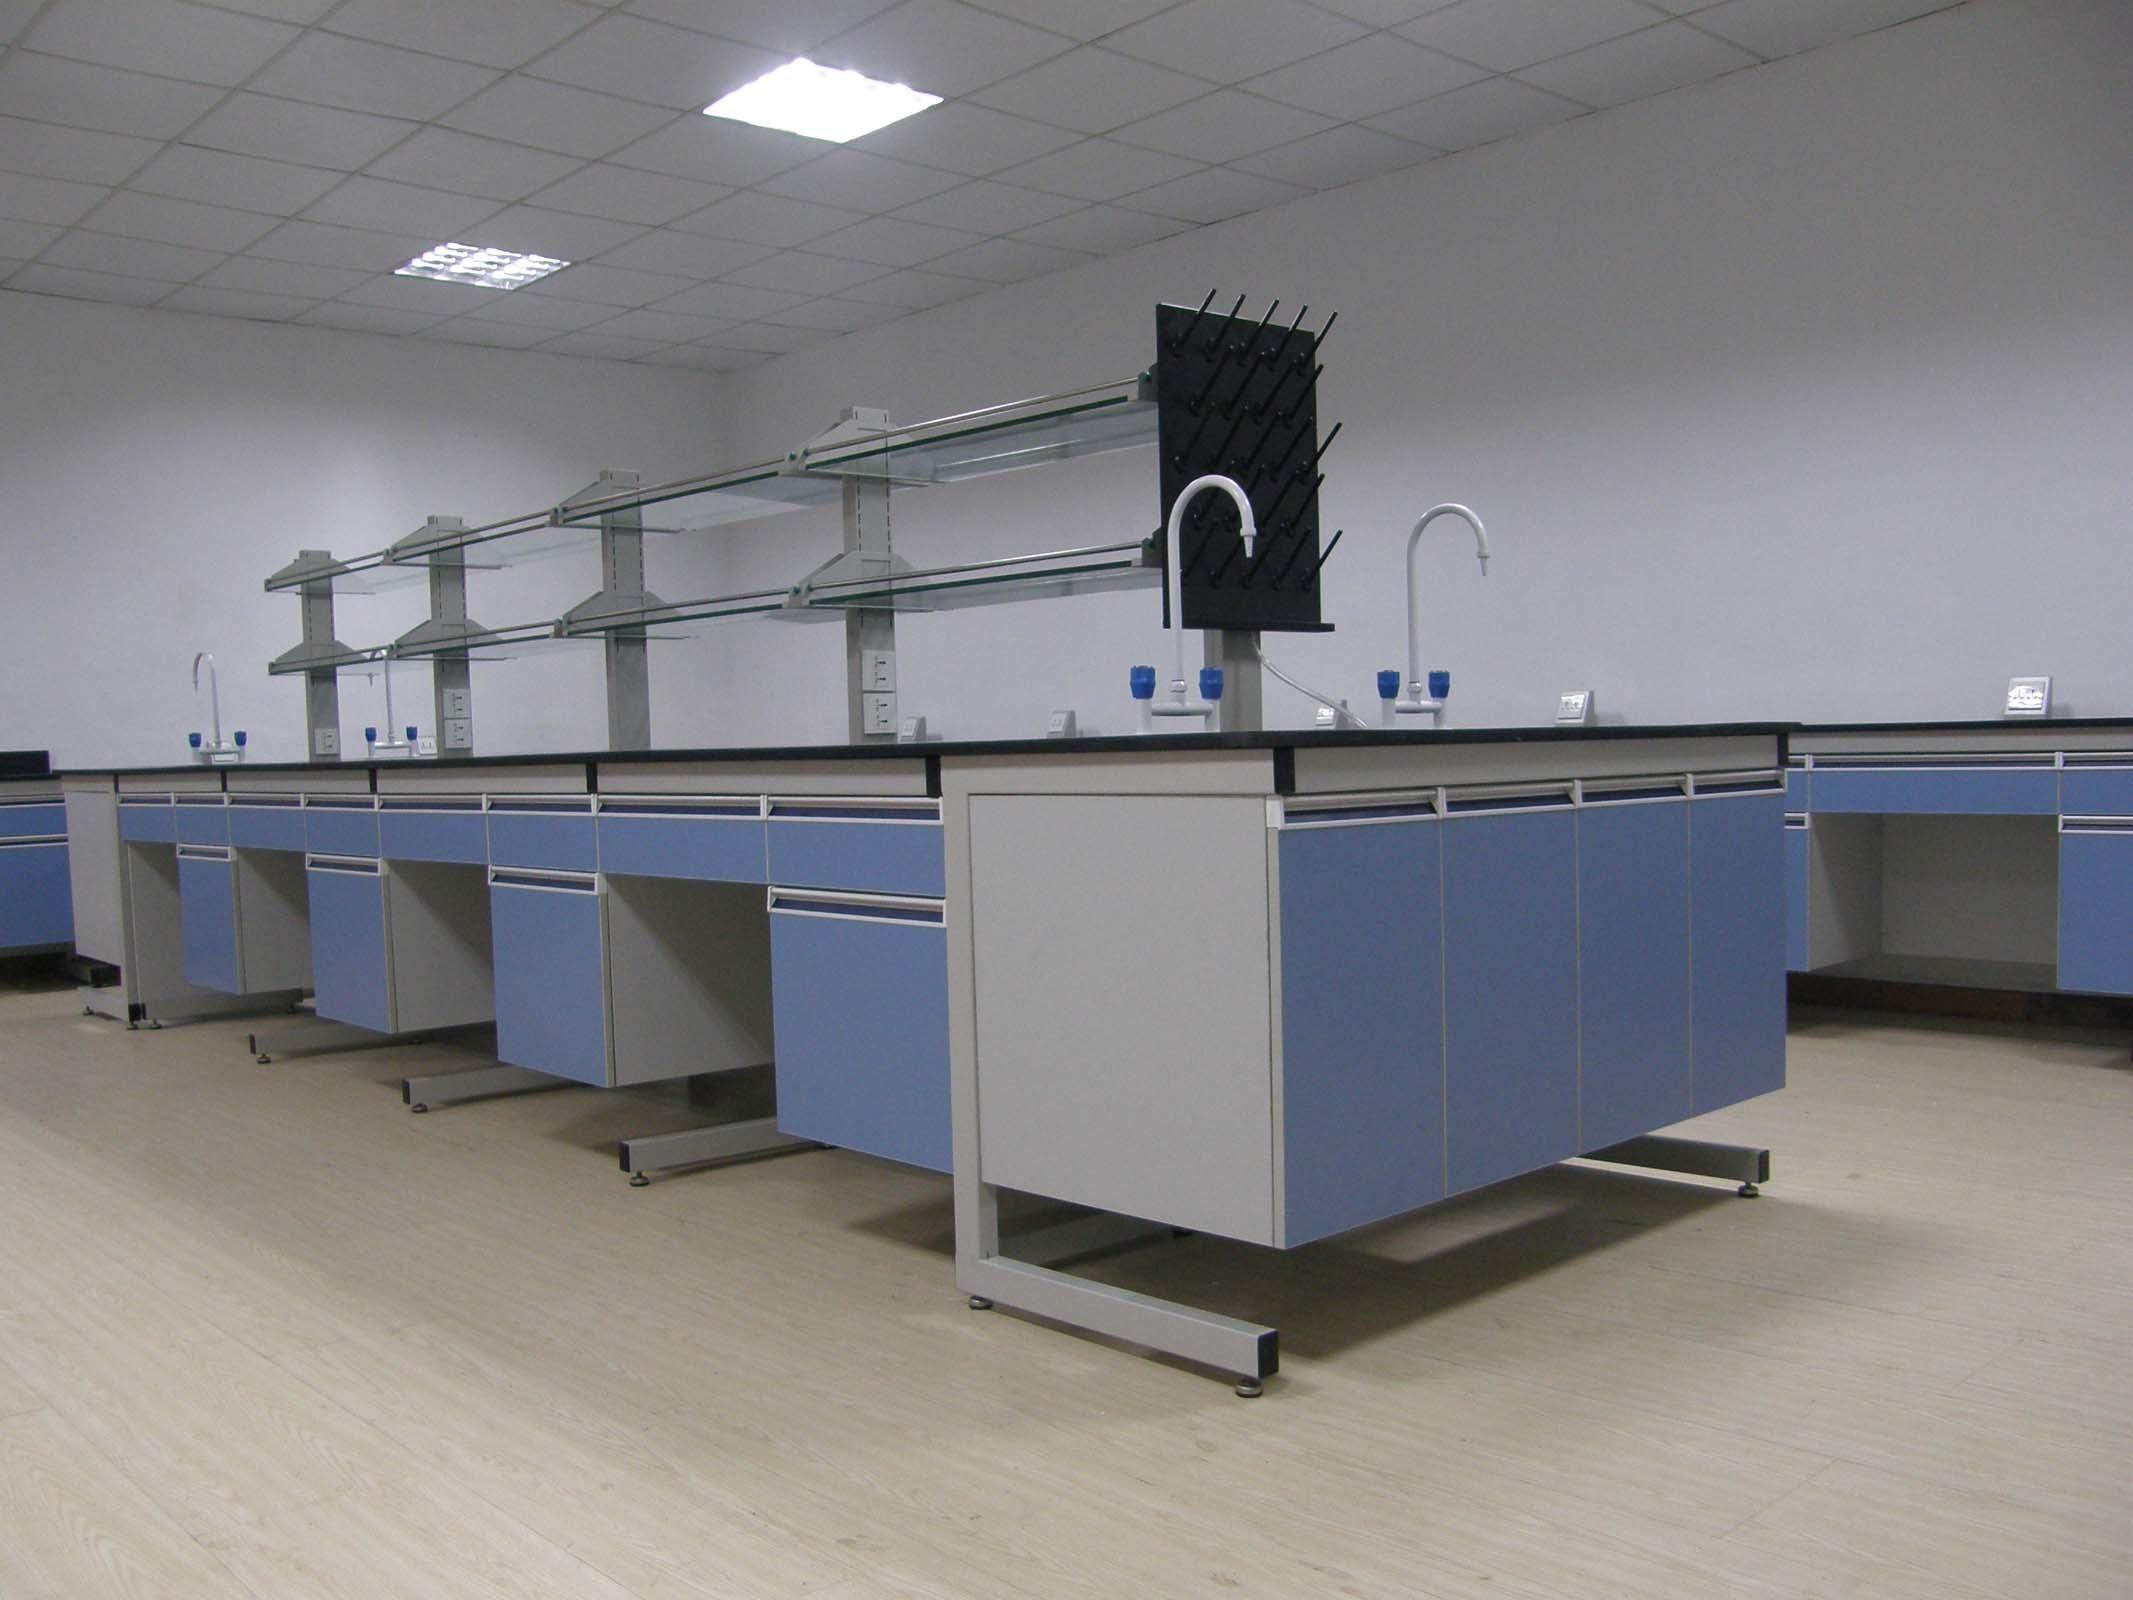 Wood and Steel Lab Furniture (Saudi Arab project)